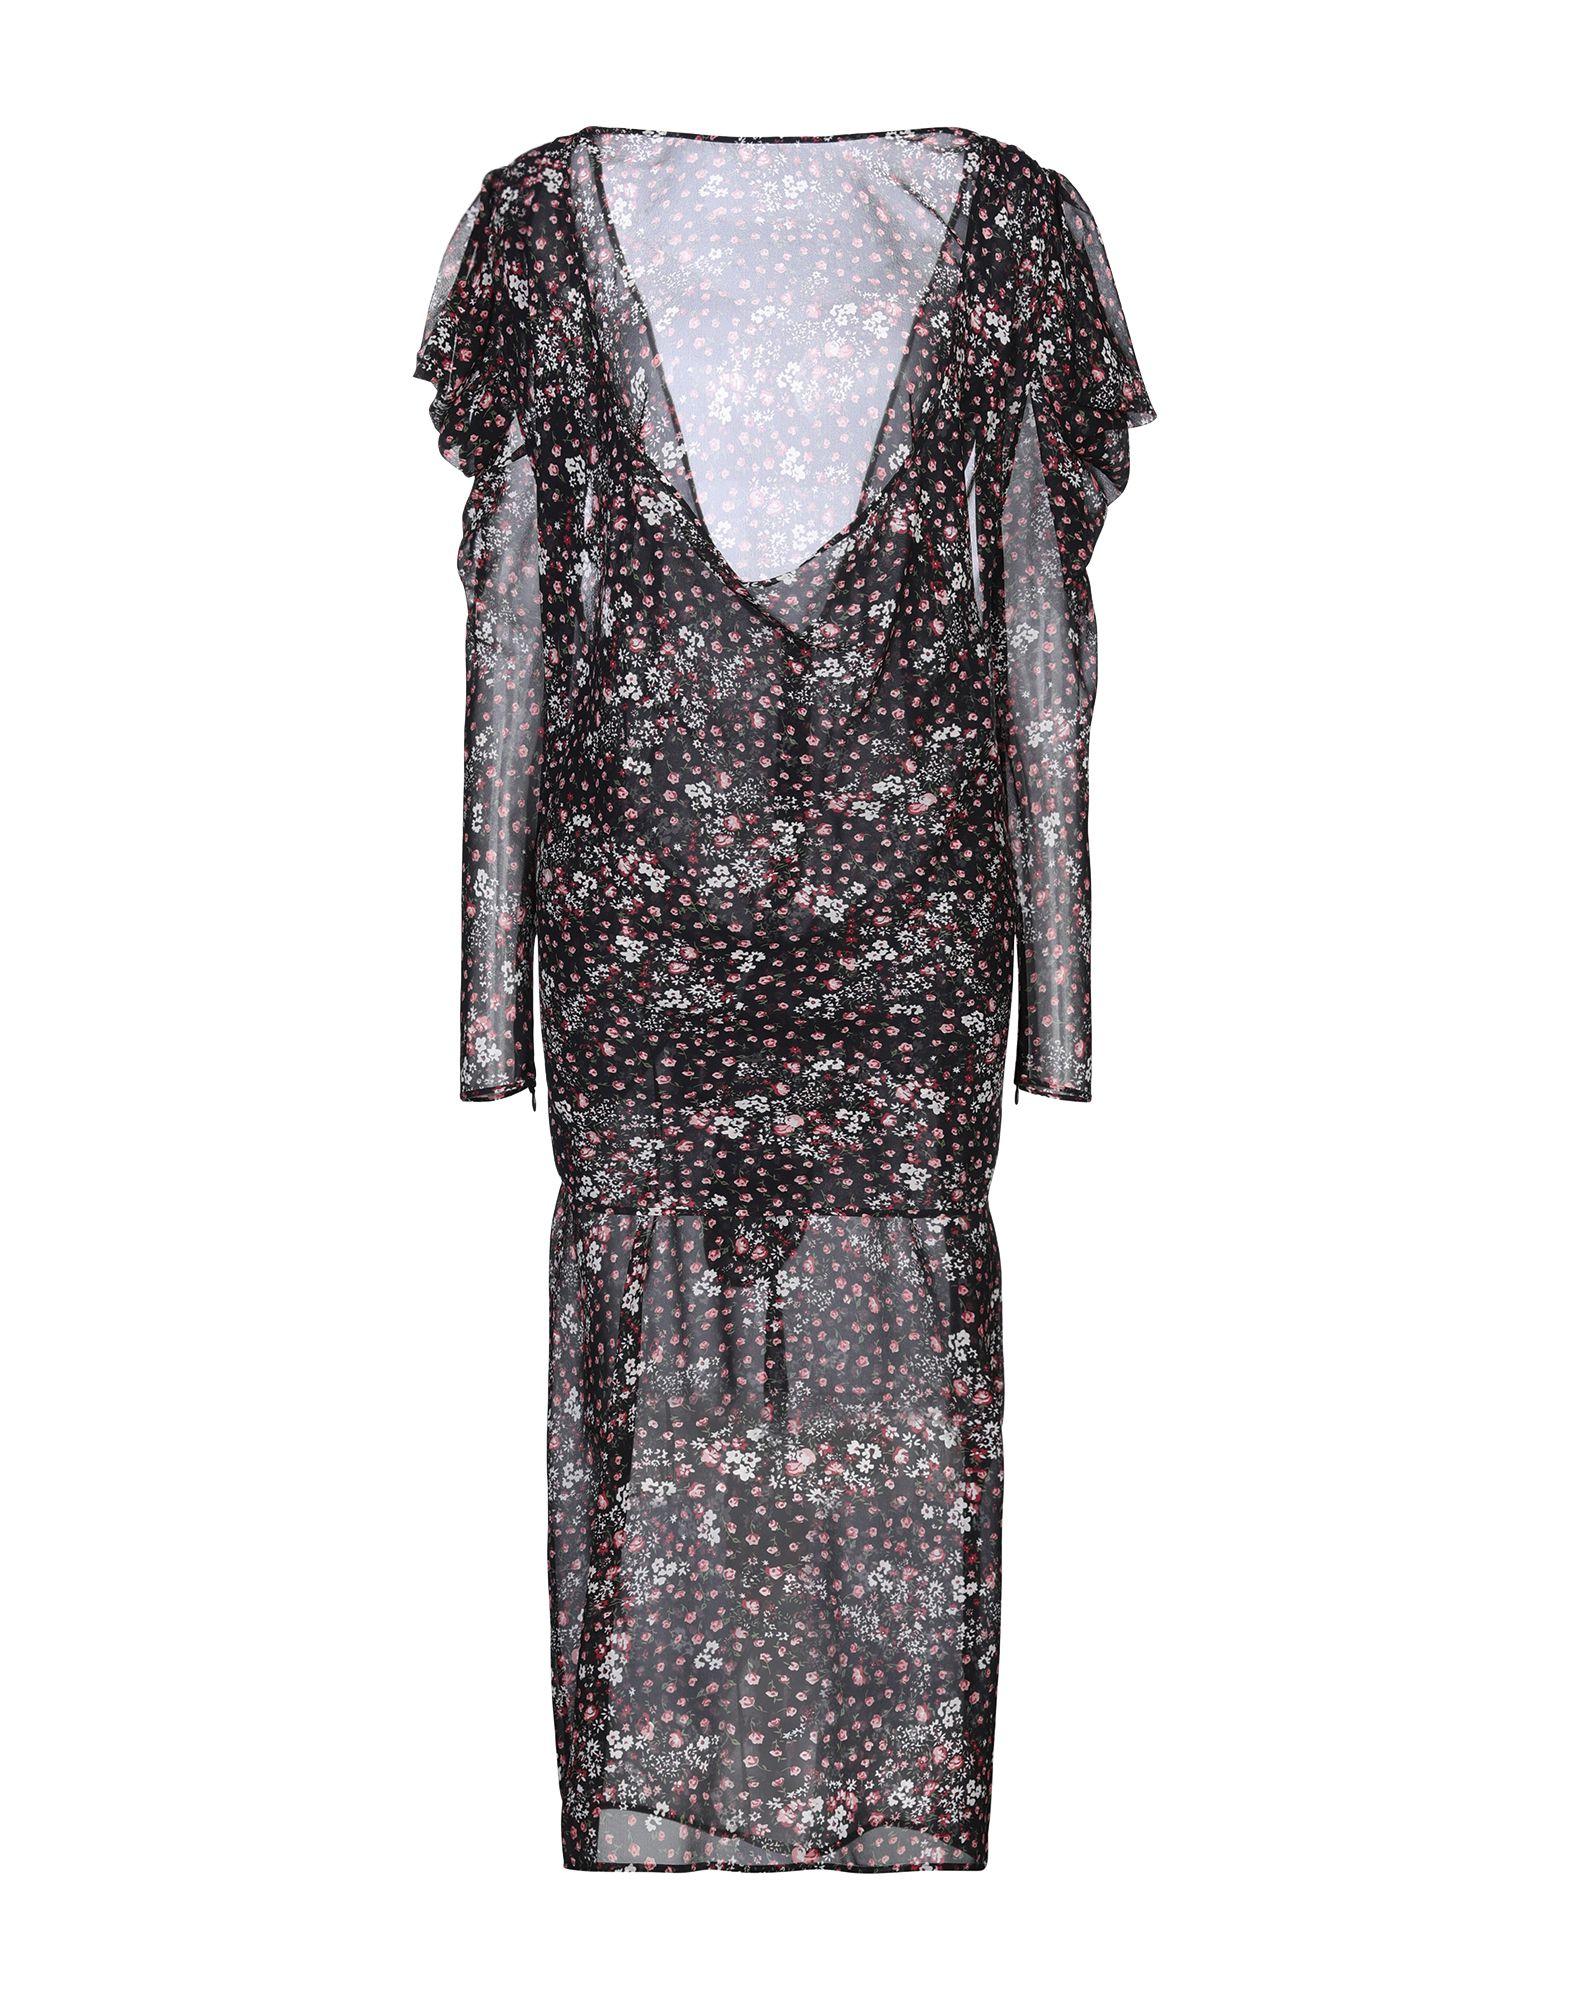 THE ATTICO Платье длиной 3/4